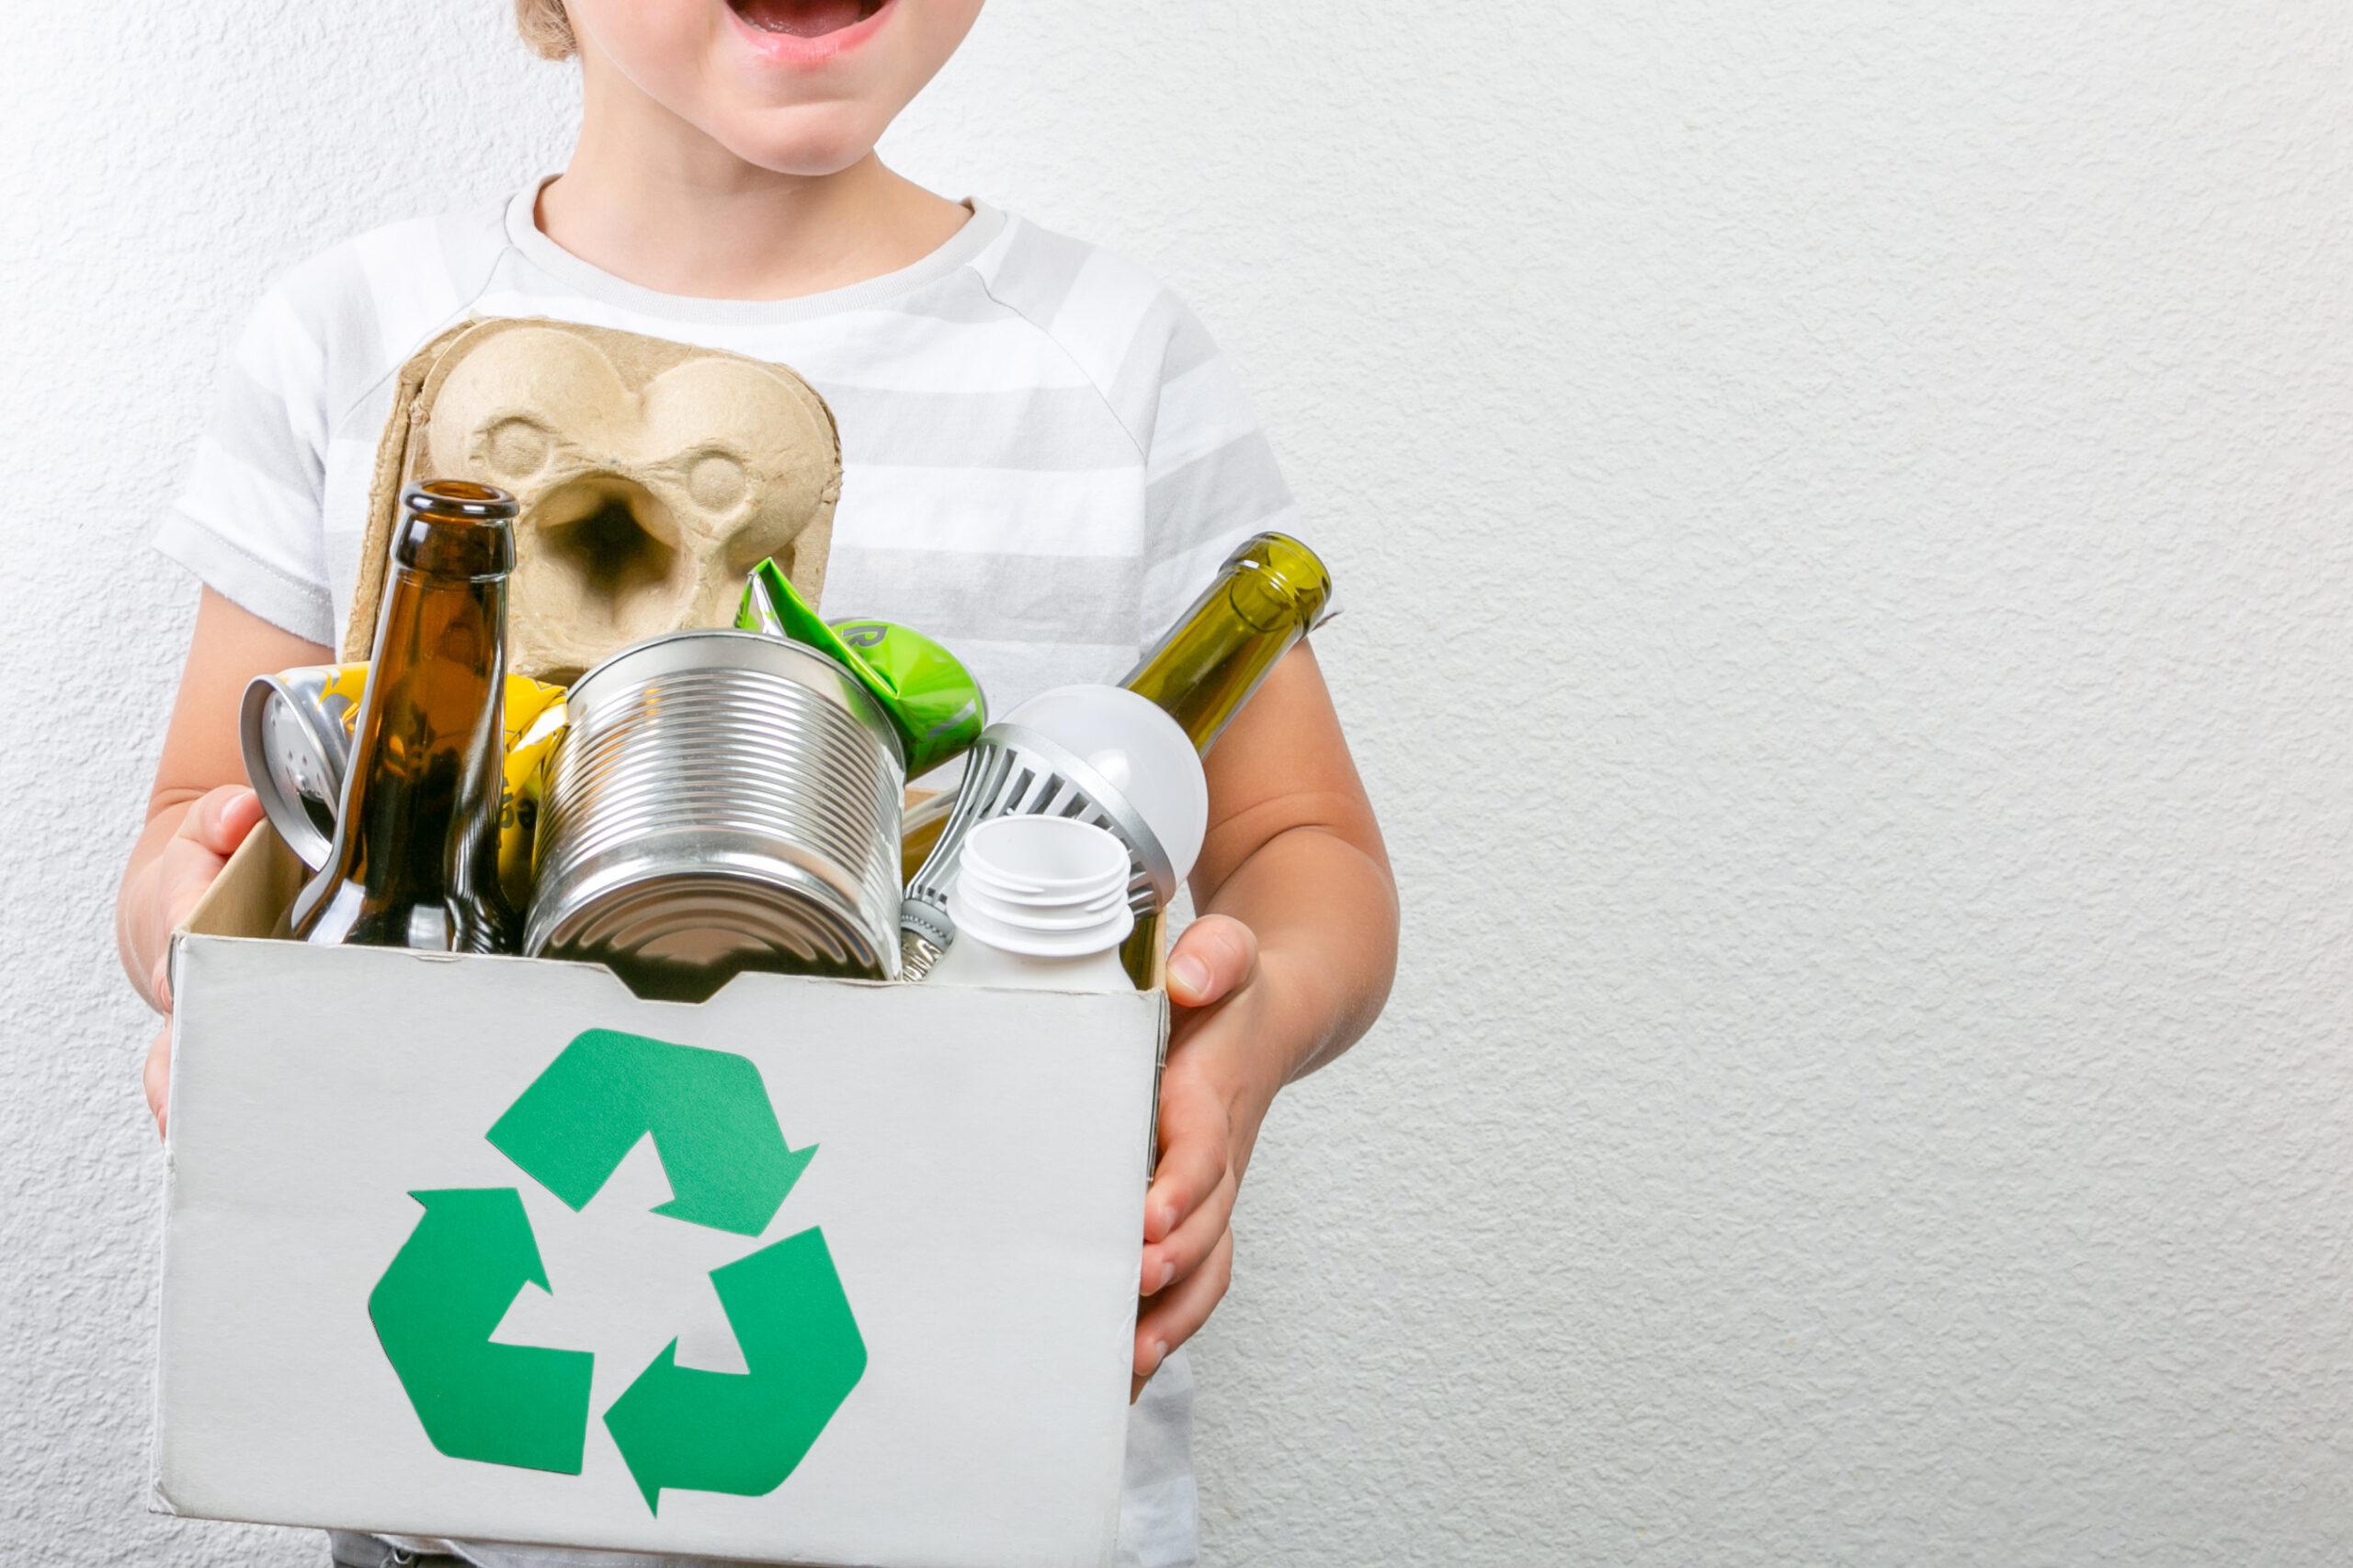 pojke håller i låda med återvinningsbara saker